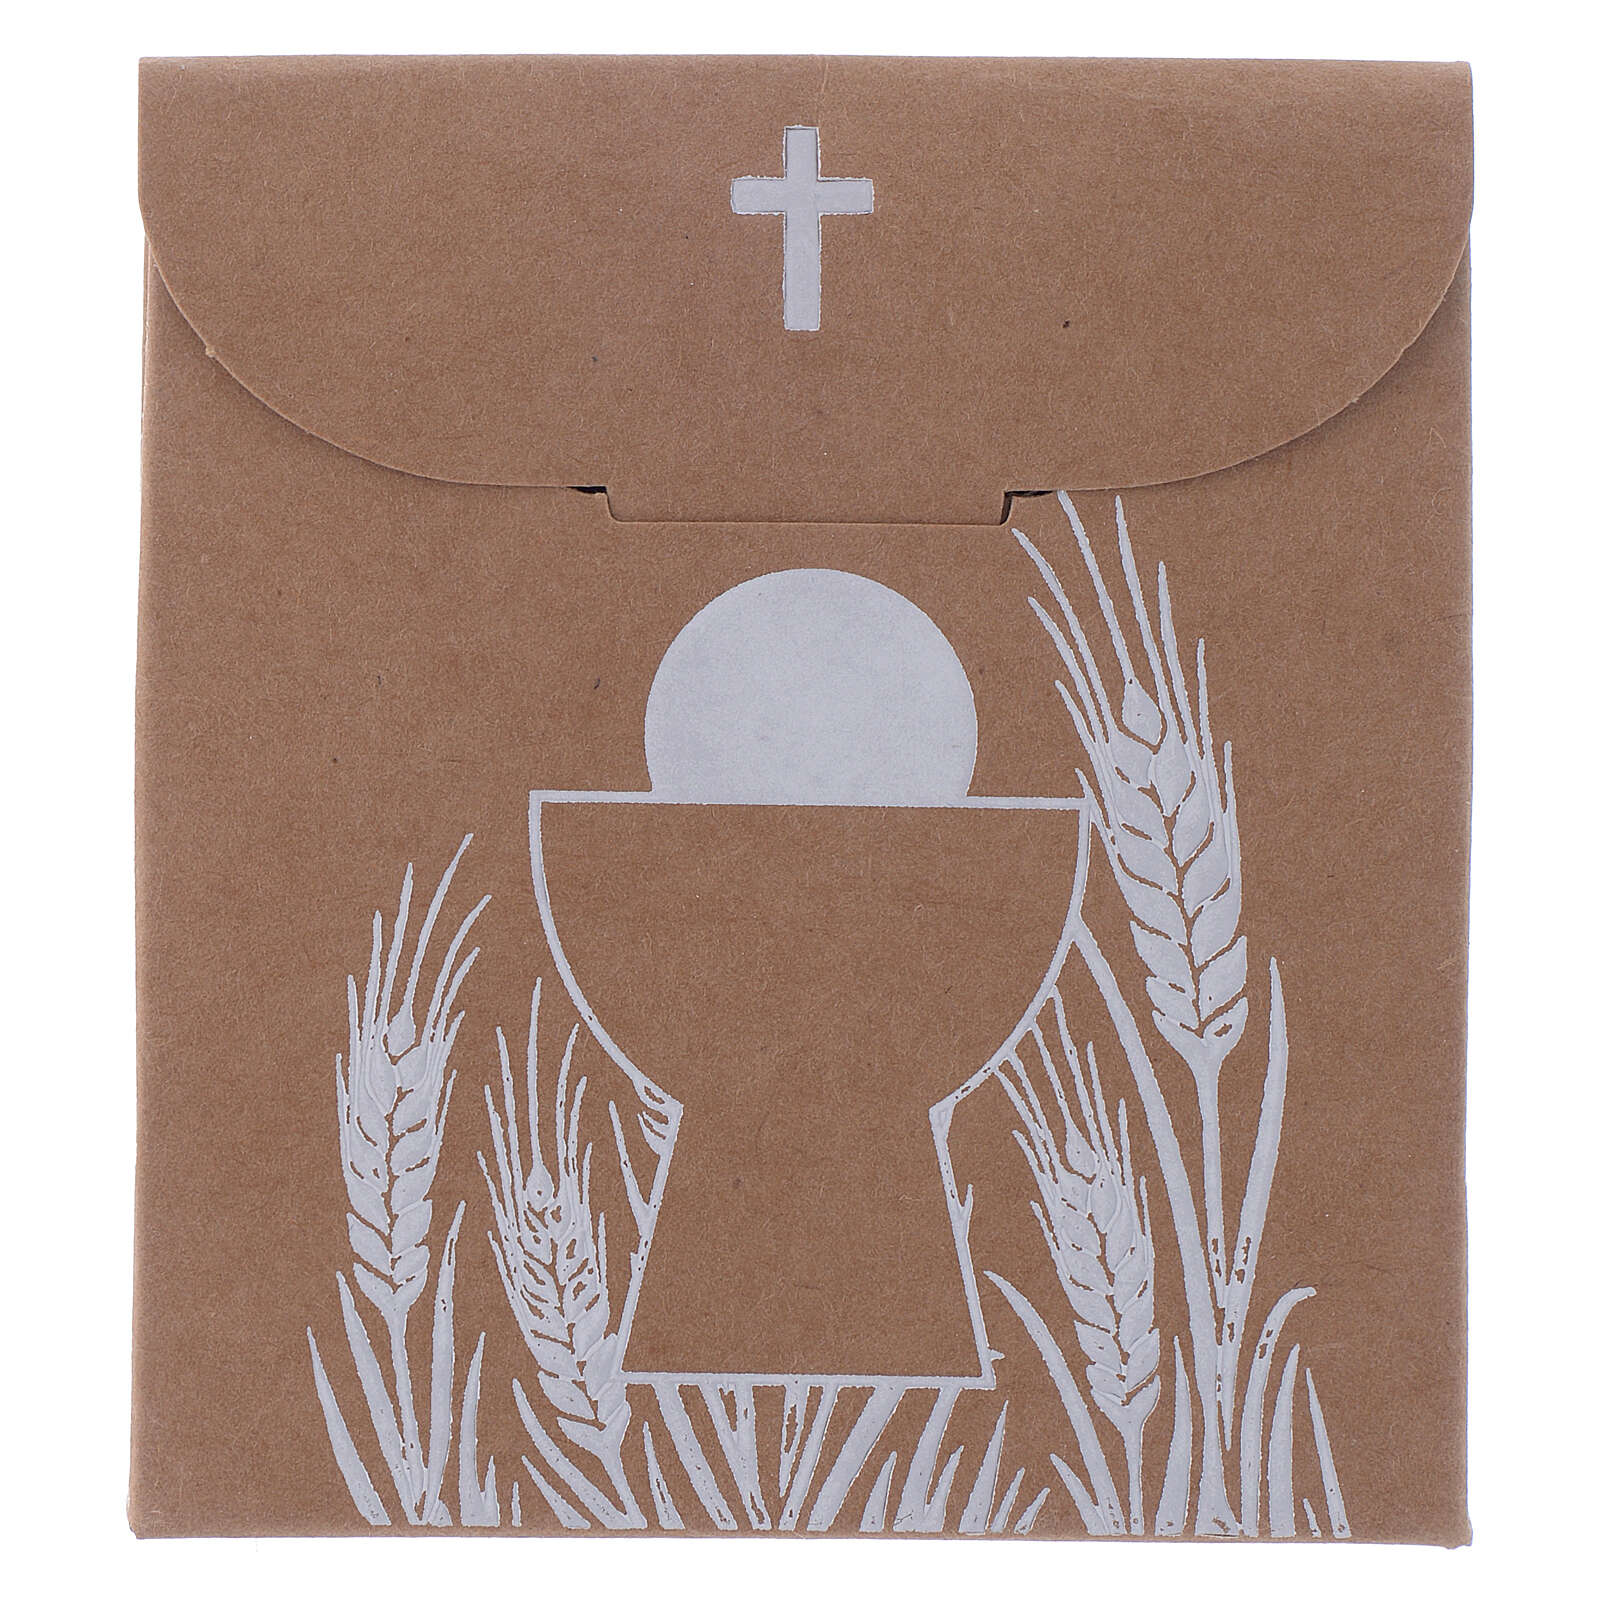 Communion gift box bag shape h 3.35 in 3